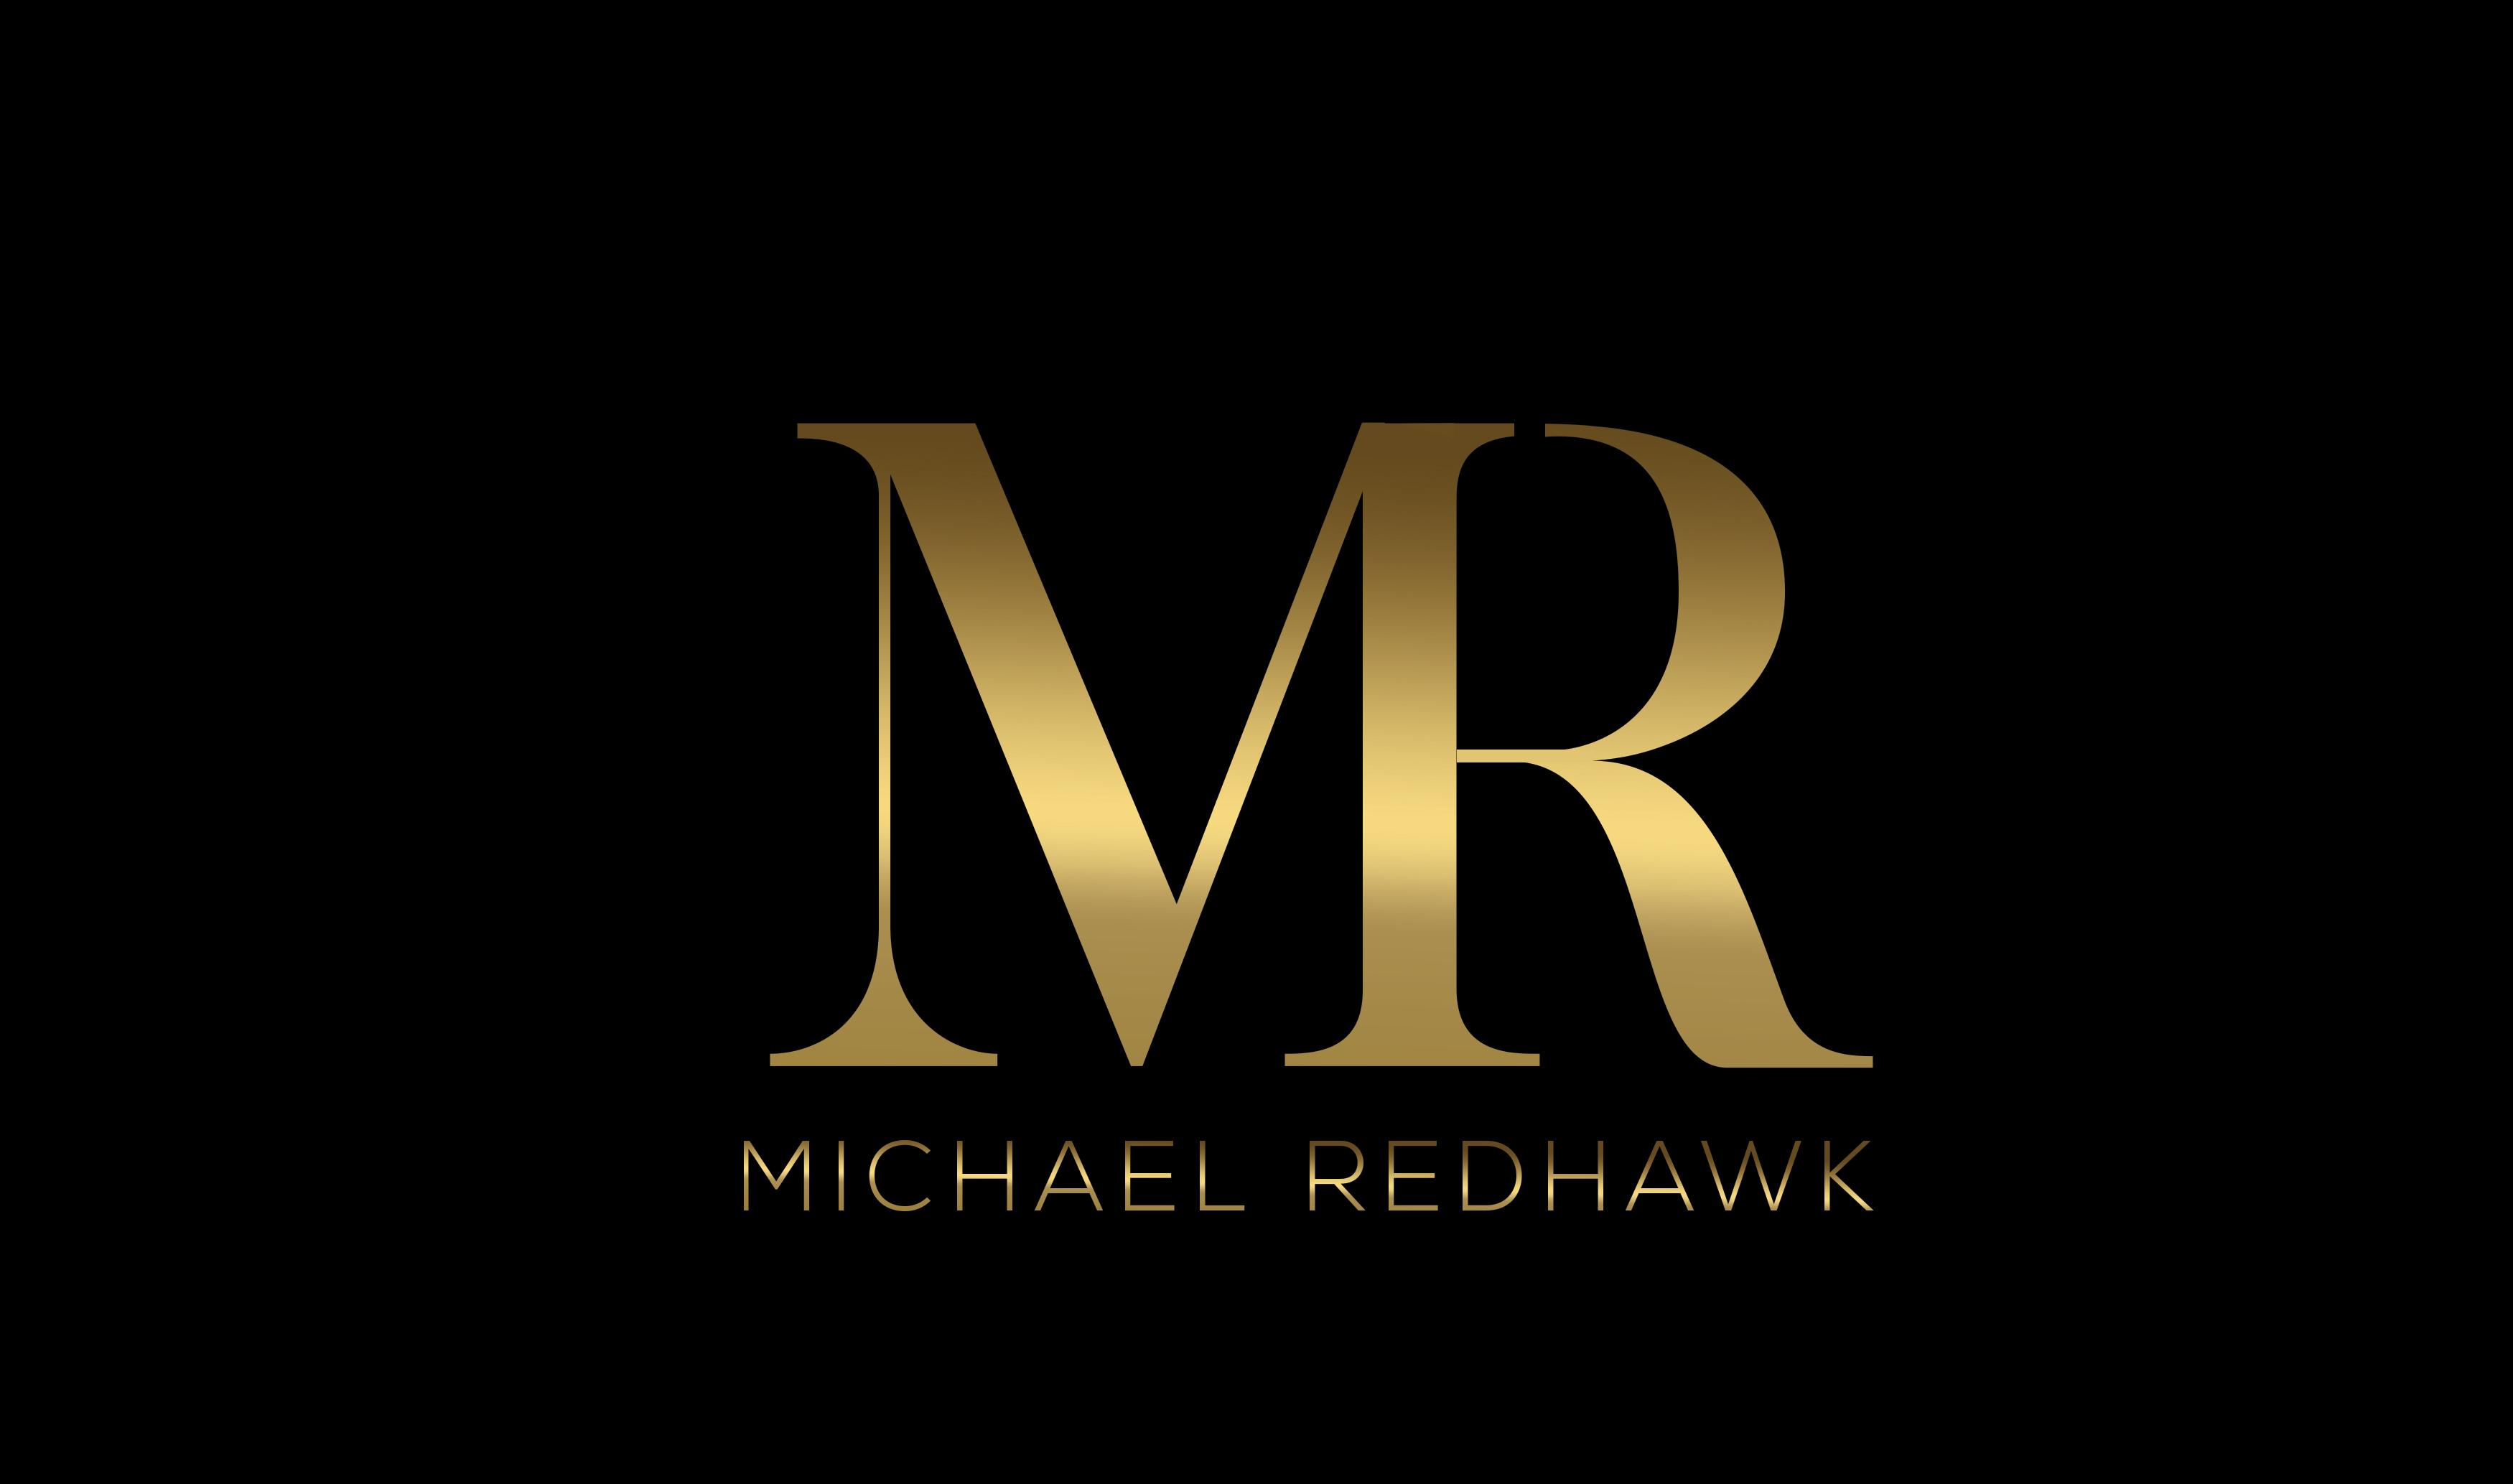 Michael Redhawk Salon